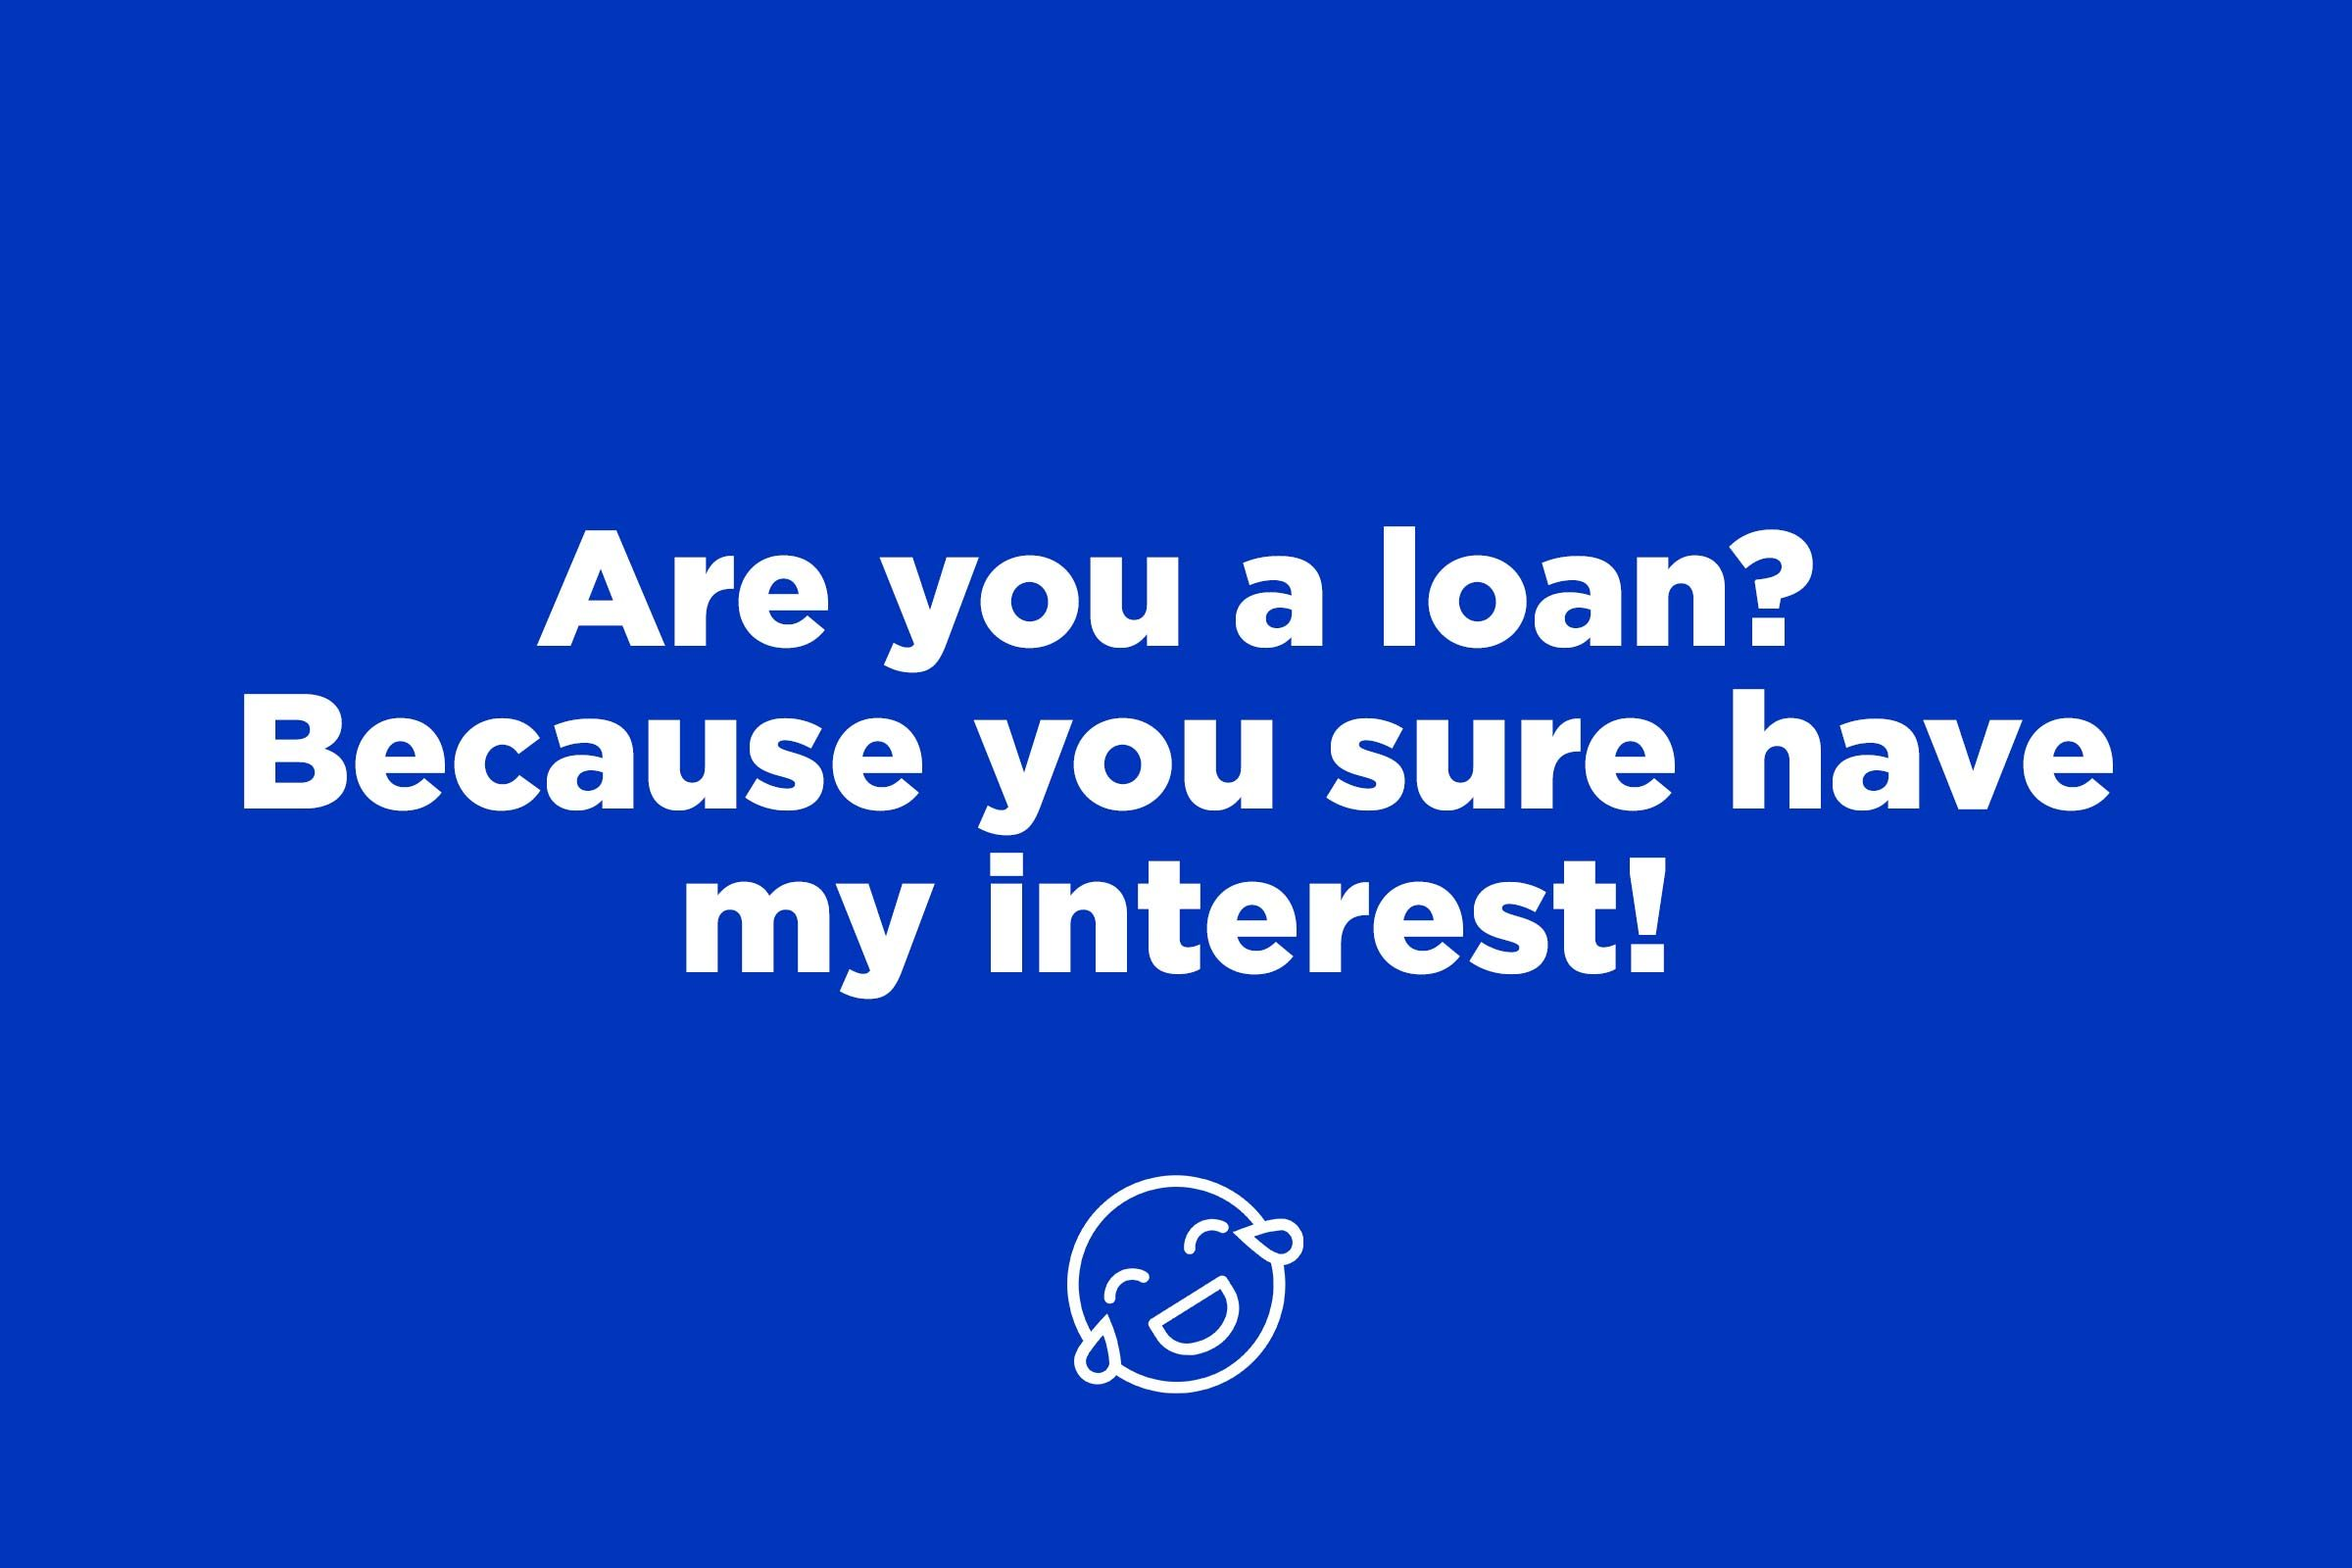 loan interest pick up line